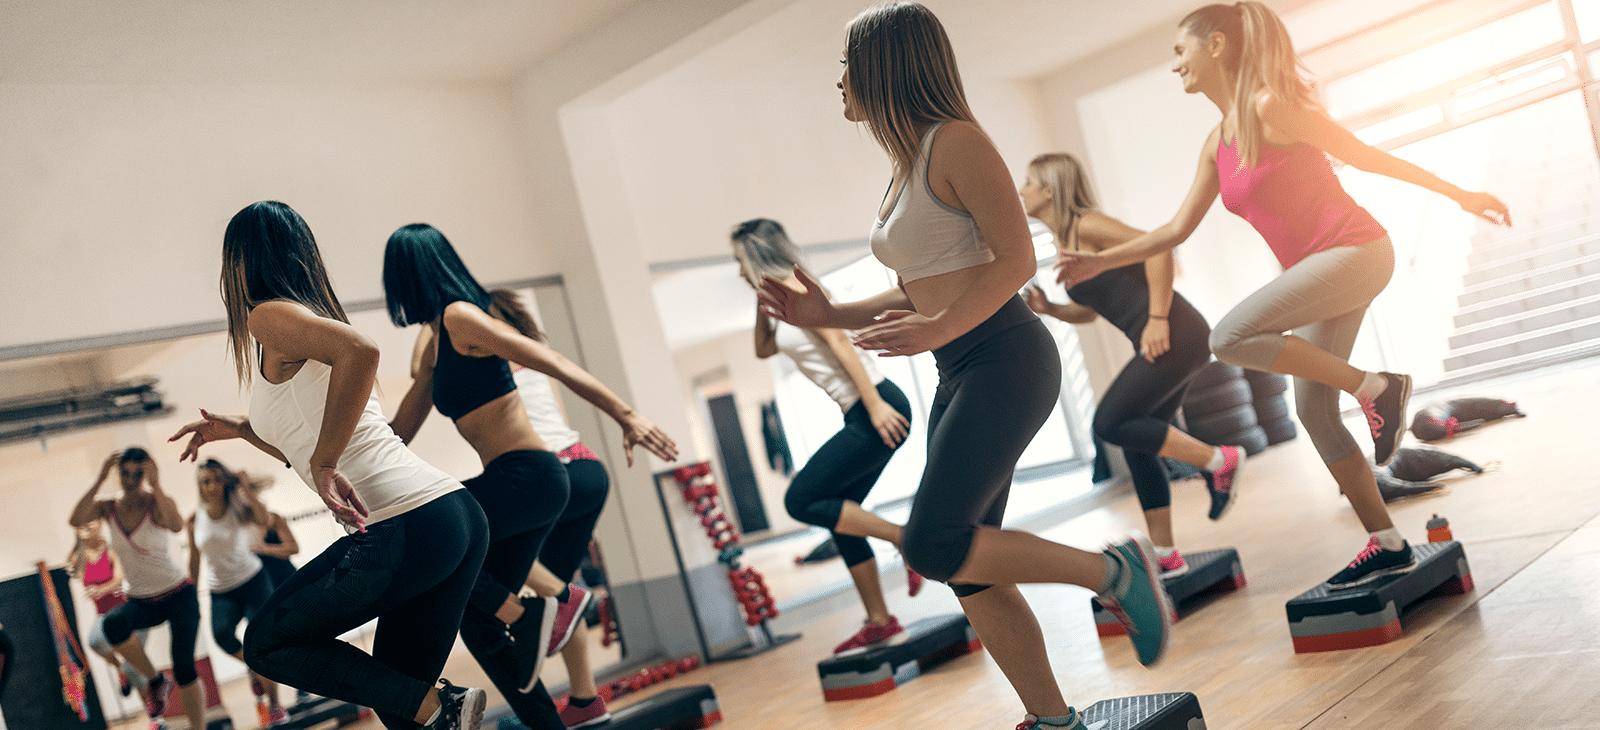 Step Aerobic Fitness-Kurs